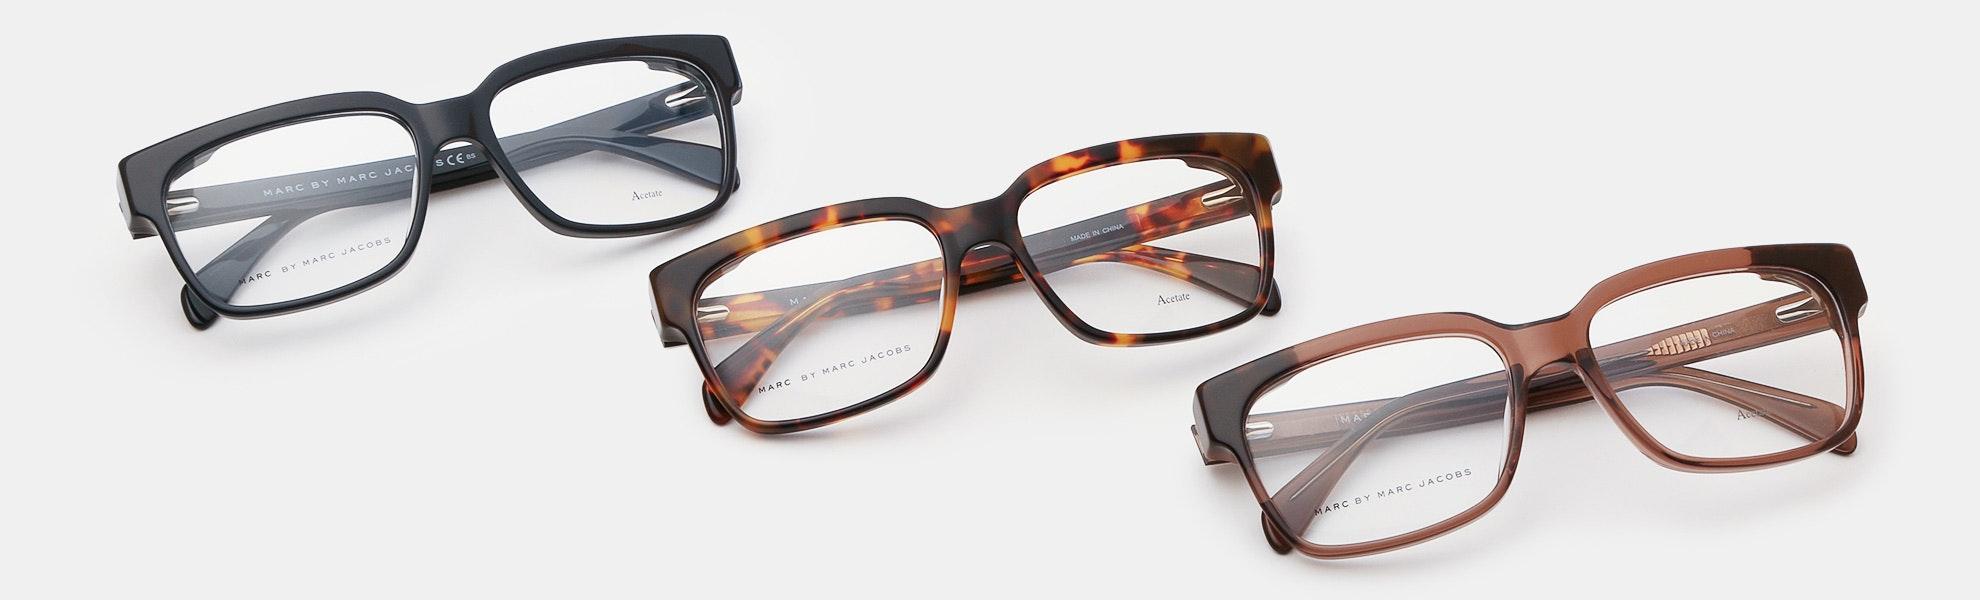 Marc by Marc Jacobs MMJ 651 Eyeglasses